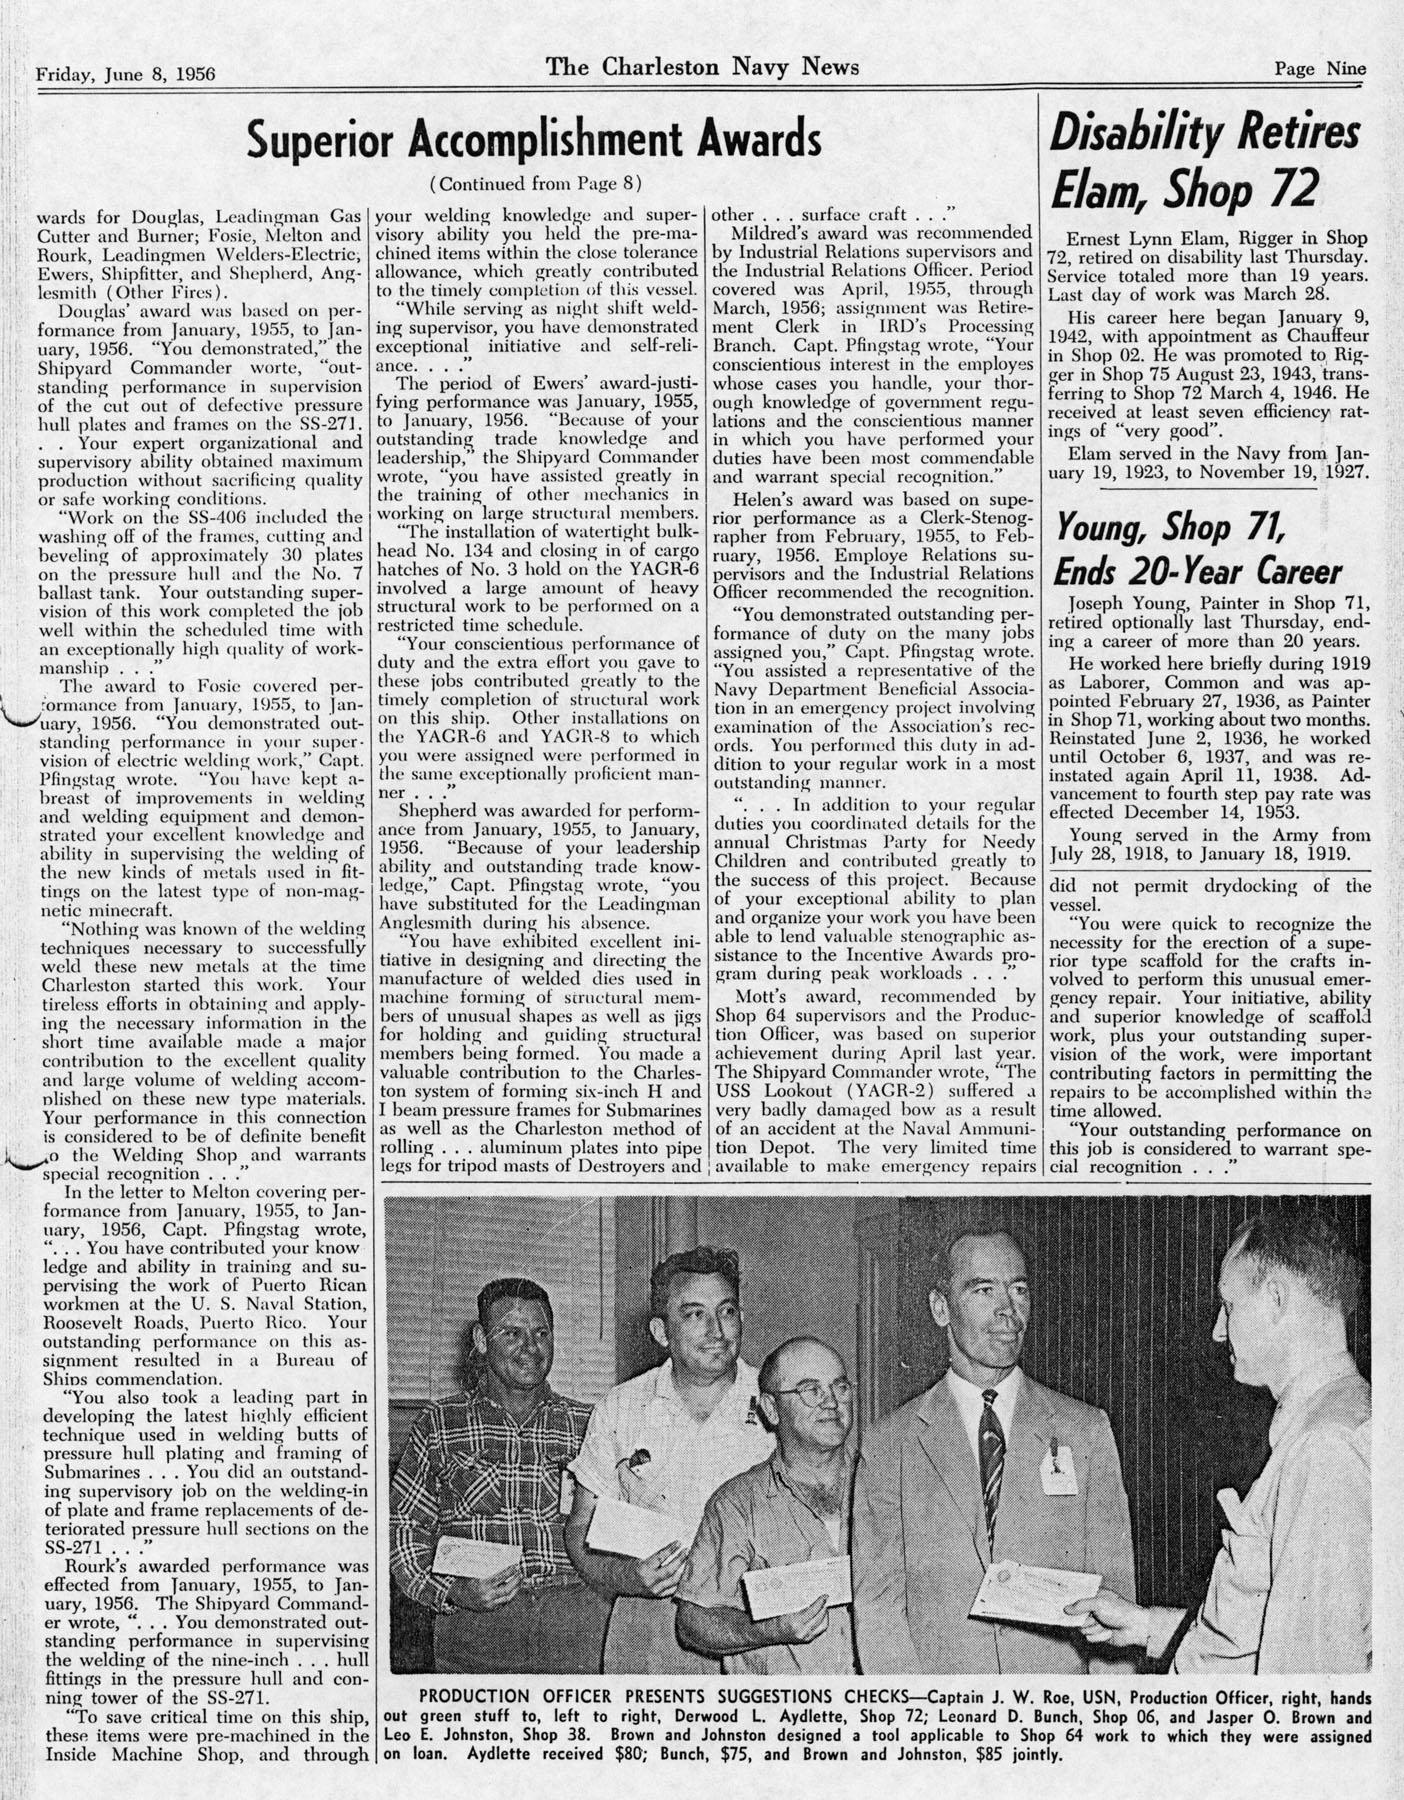 The Charleston Navy News, Volume 14, Edition 23, page ix